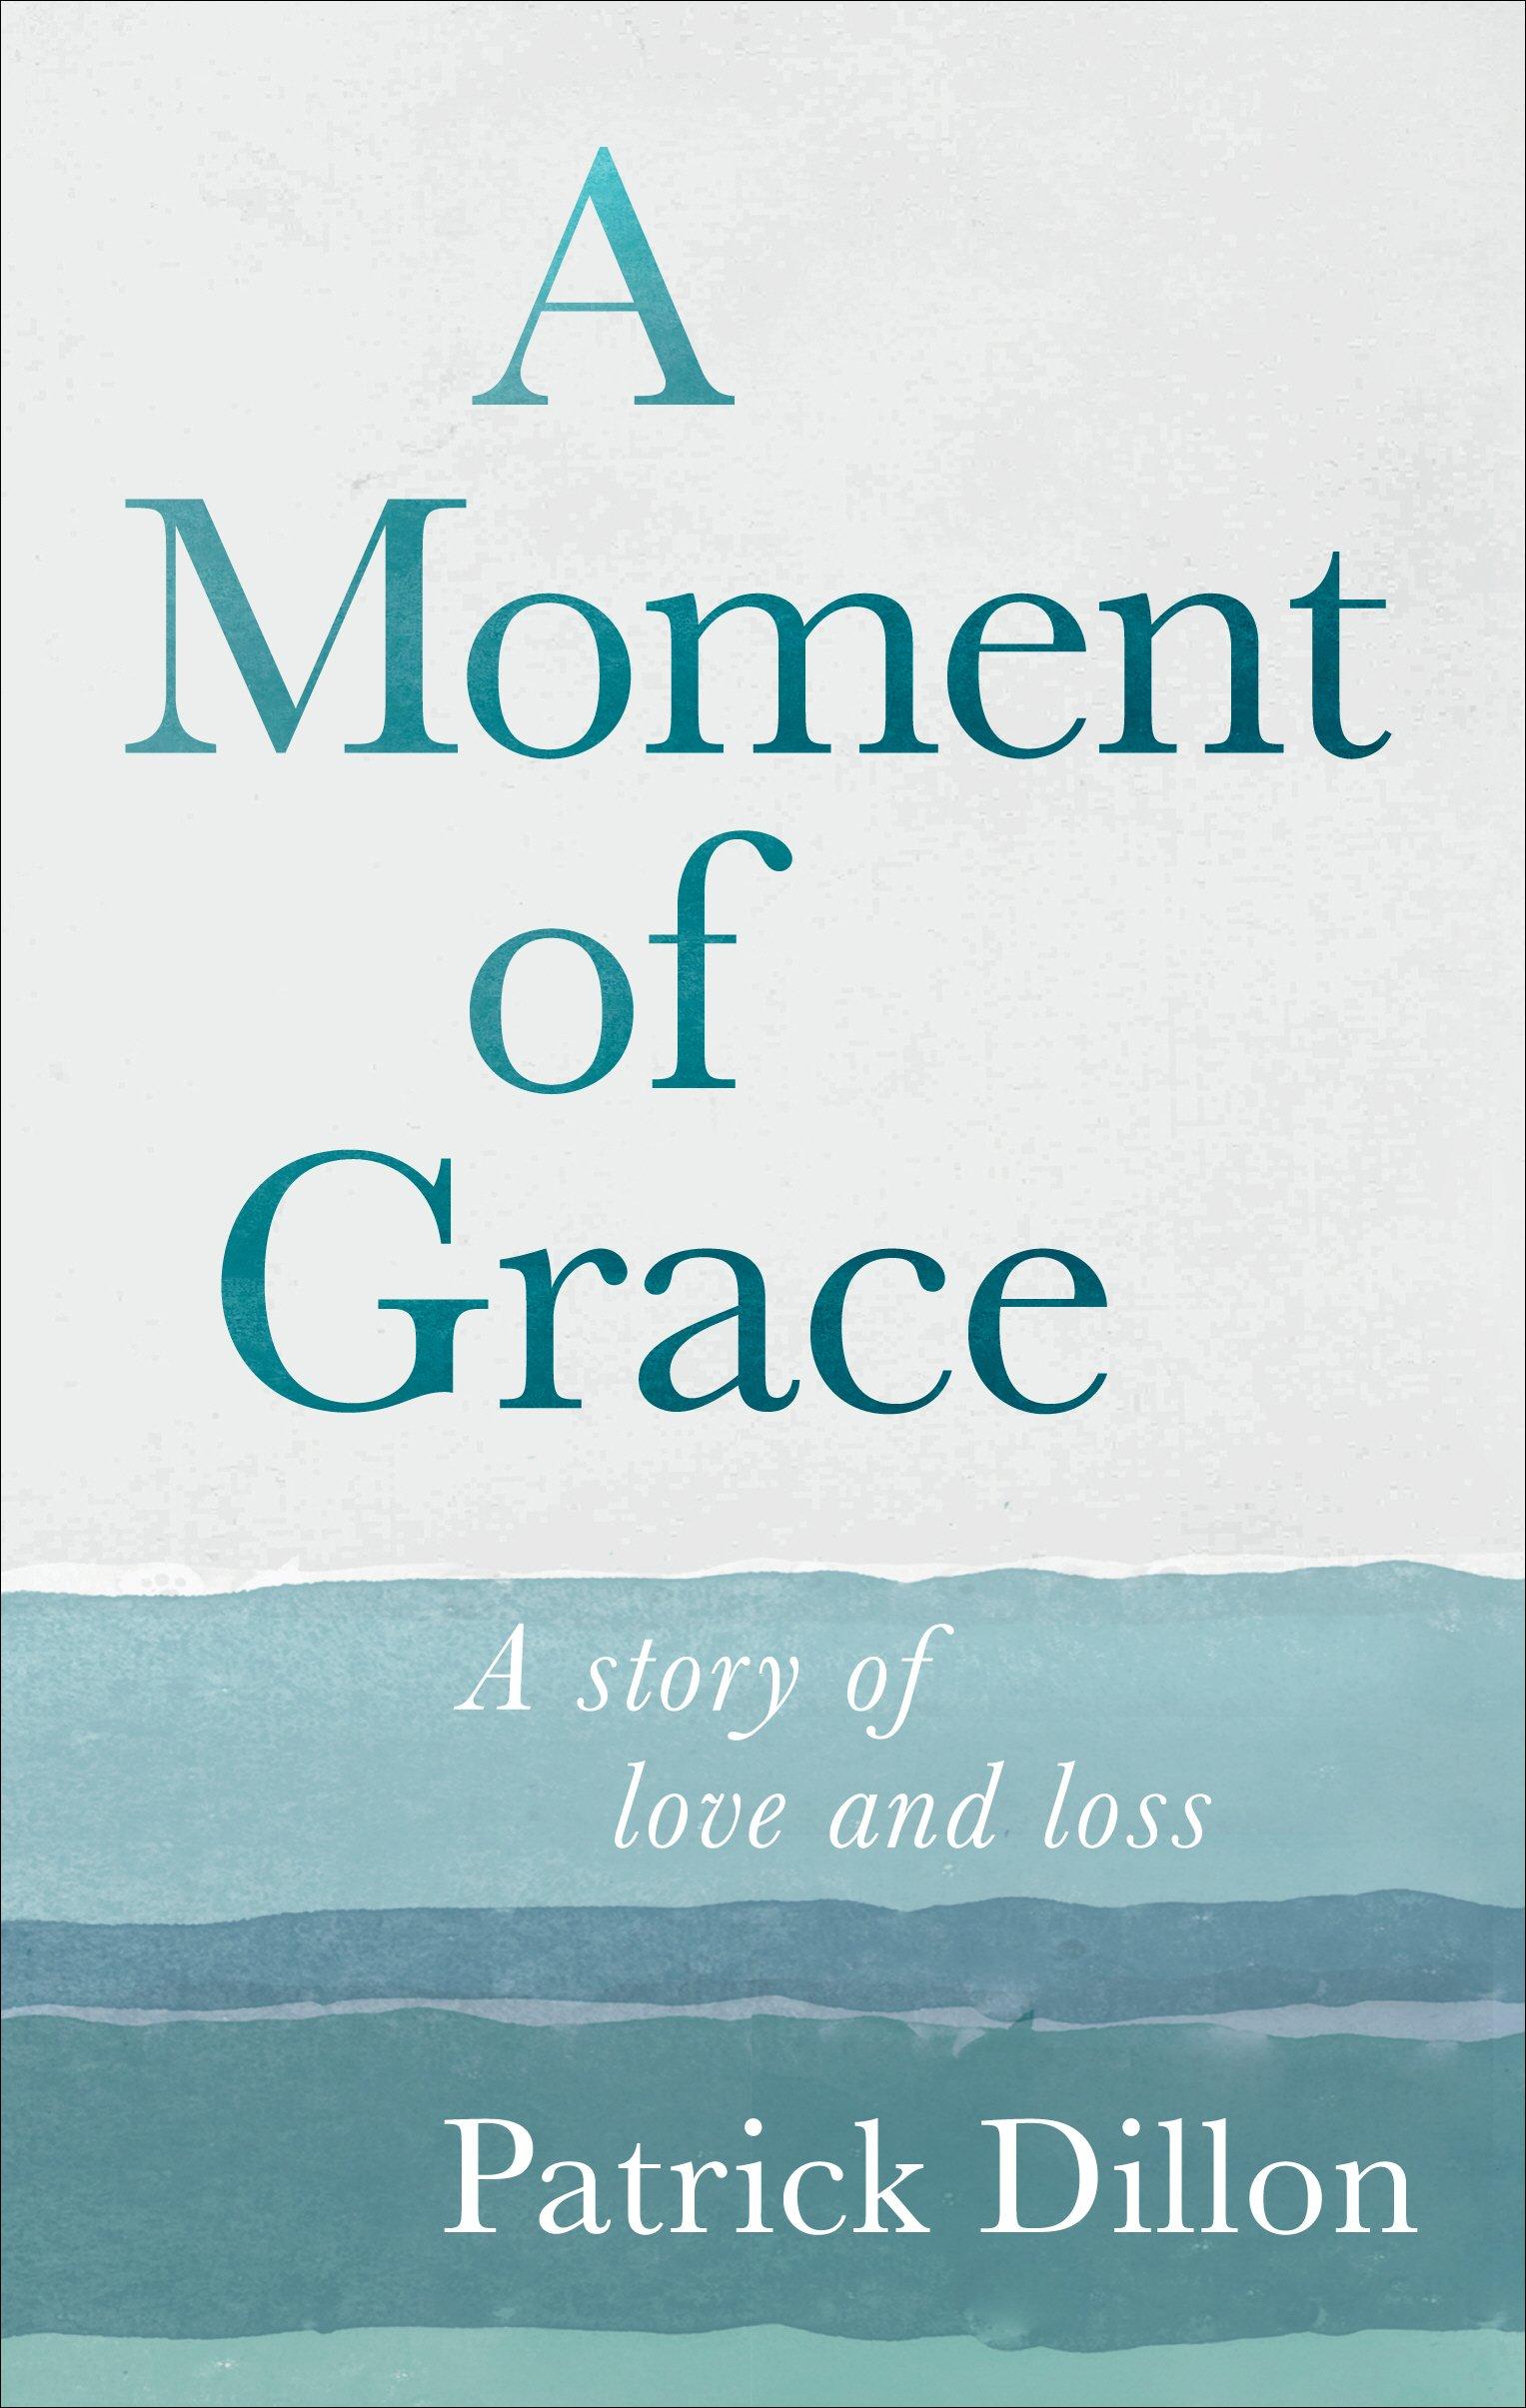 Moment Of Grace >> A Moment Of Grace Patrick Dillon Author 9781785038464 Amazon